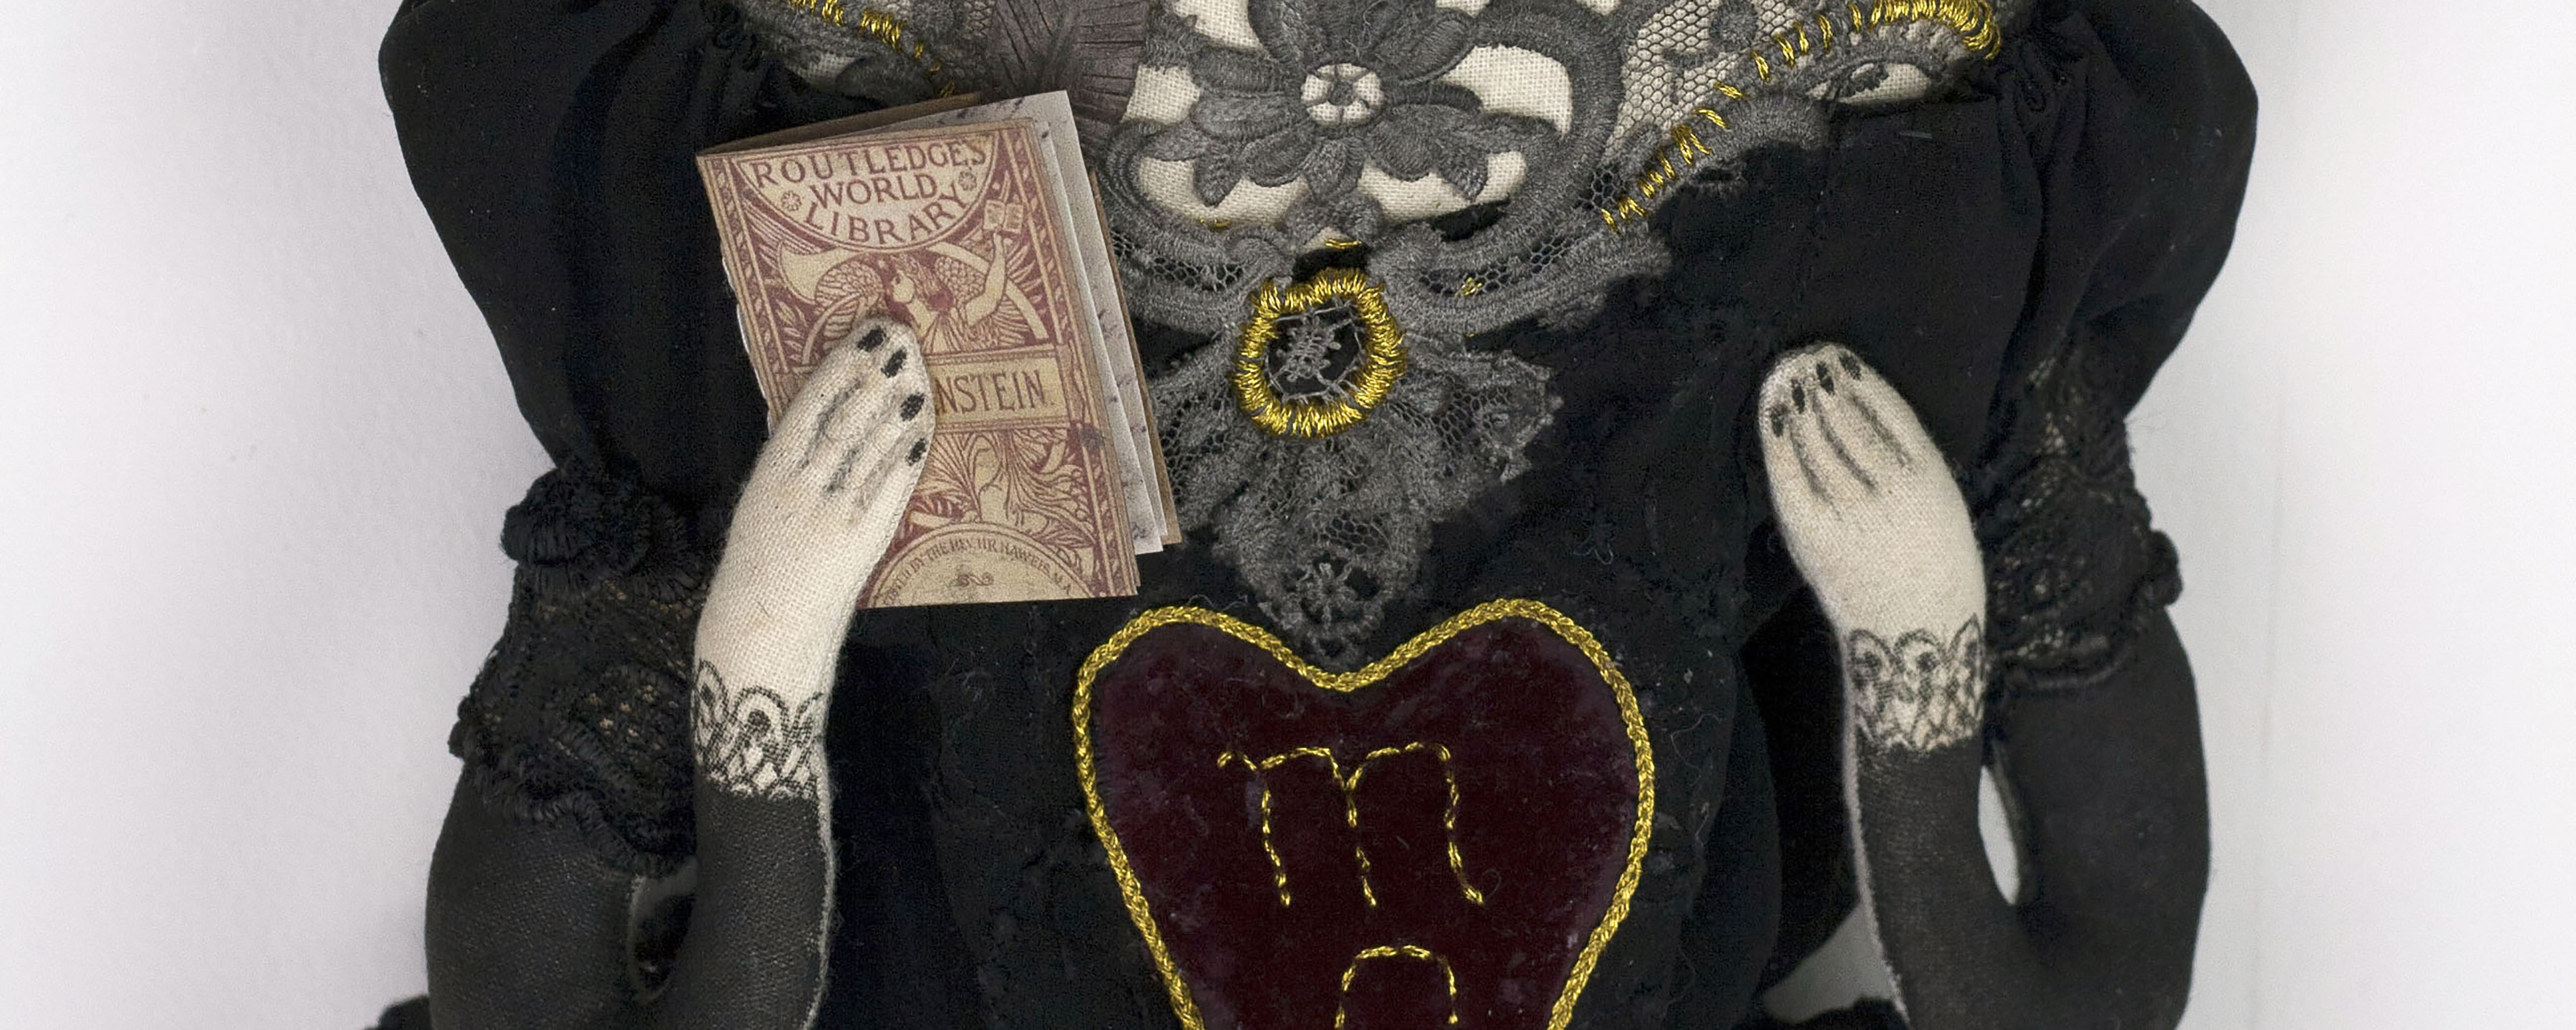 Mary Shelley Gallery